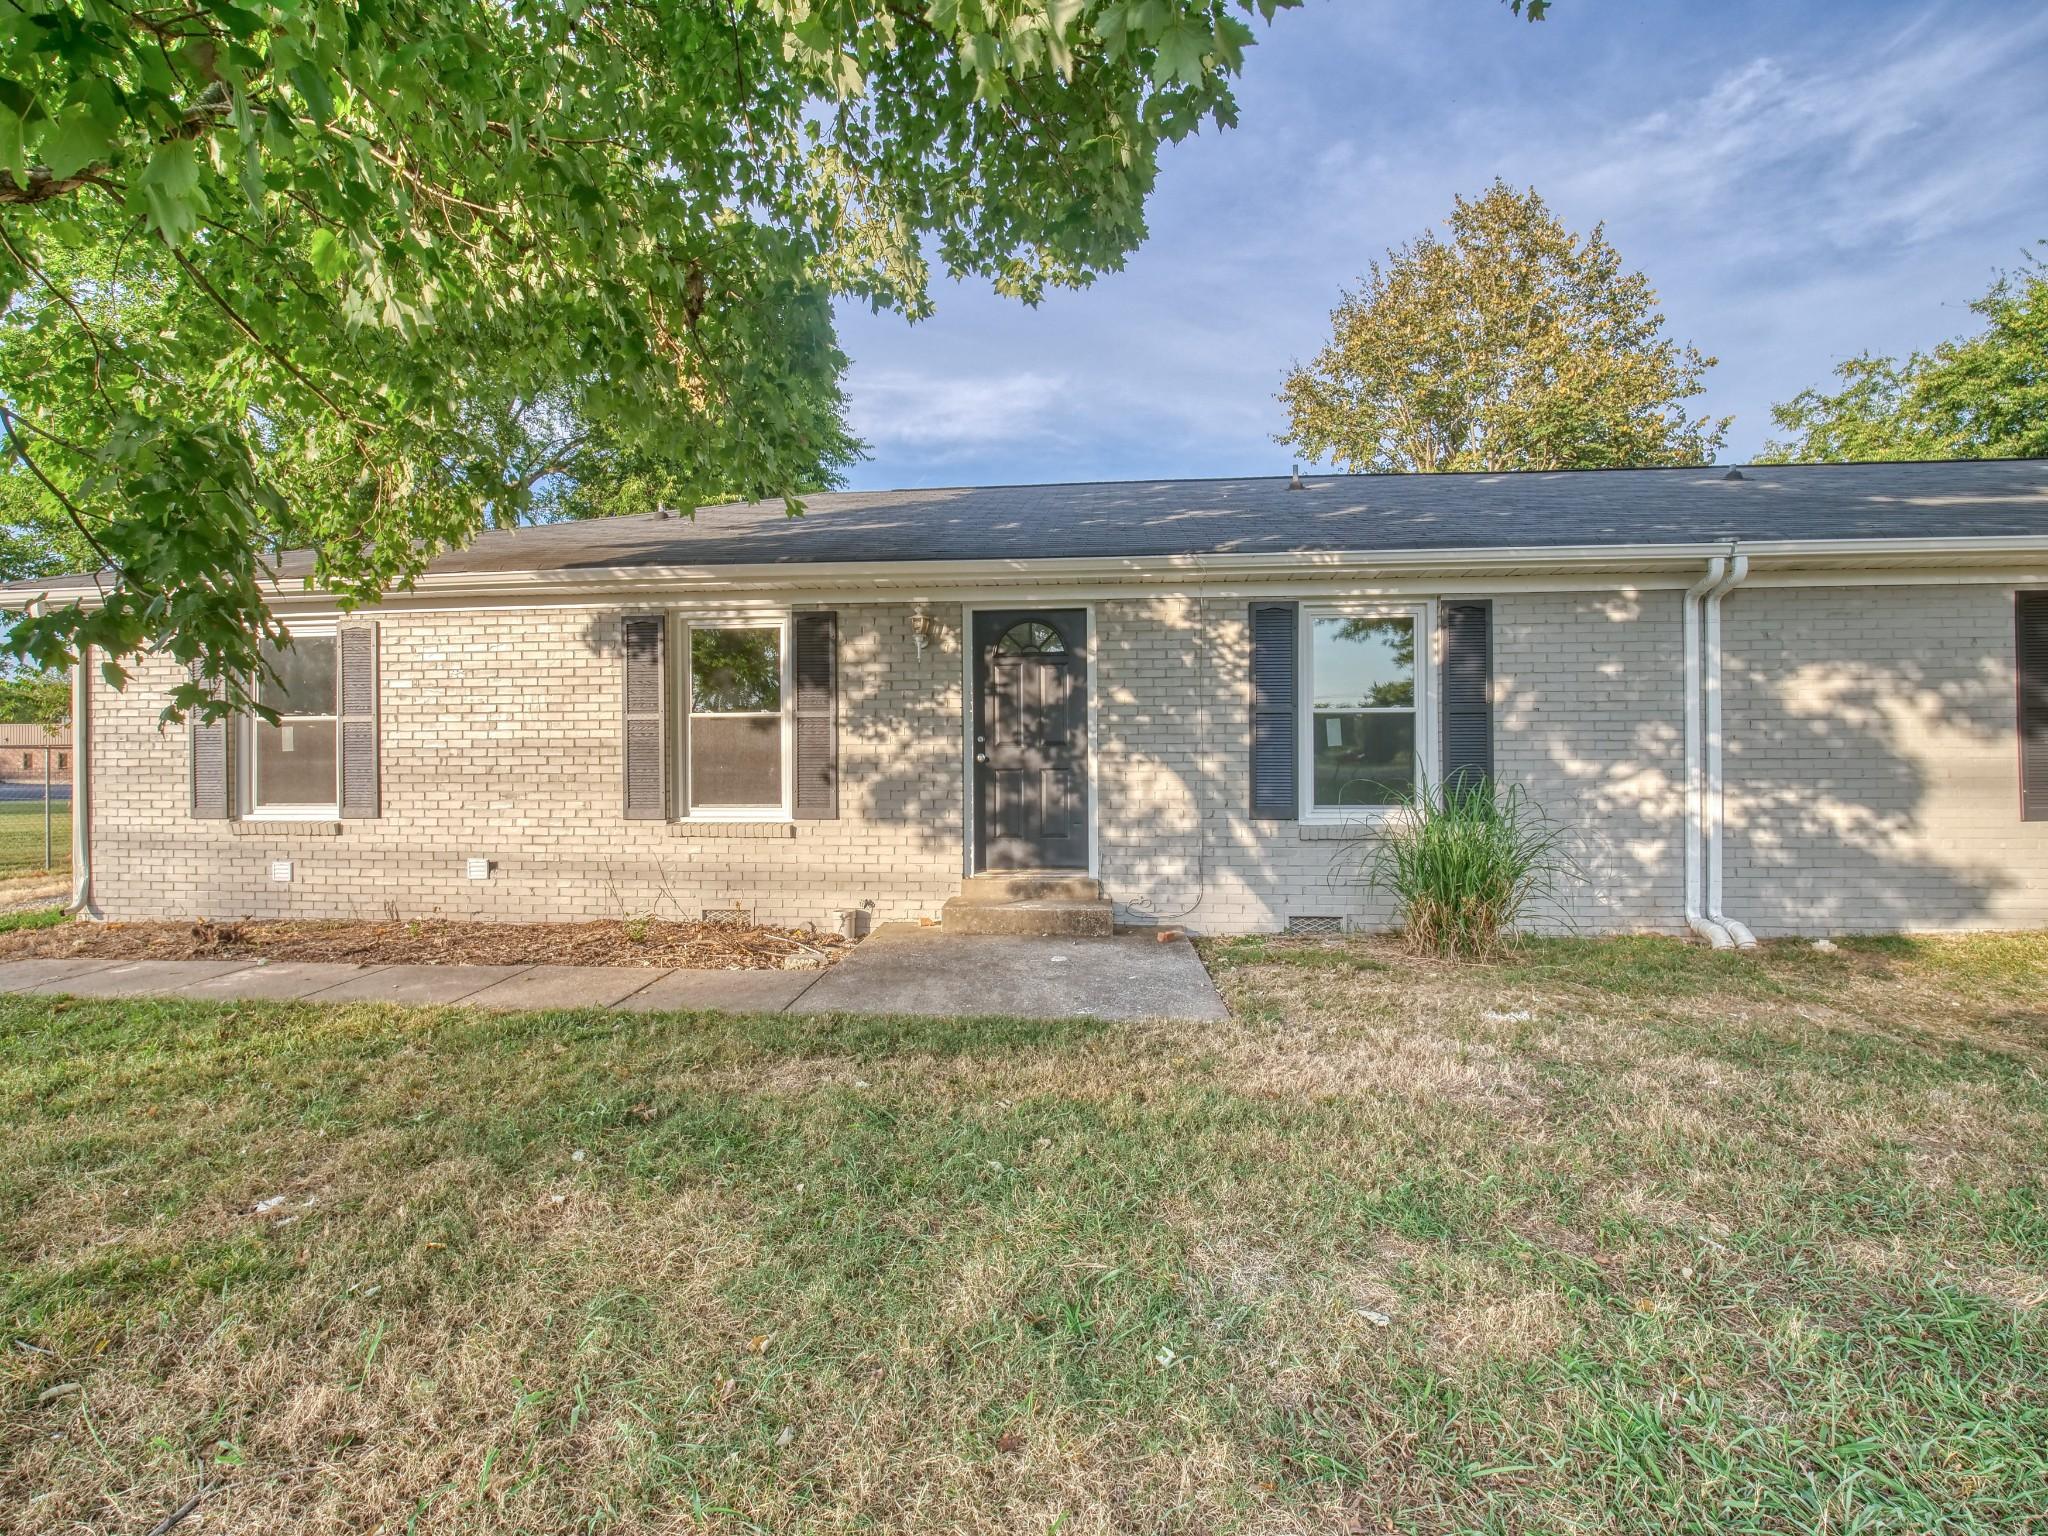 6722 Old Nashville Hwy, Murfreesboro, TN 37129 - Murfreesboro, TN real estate listing